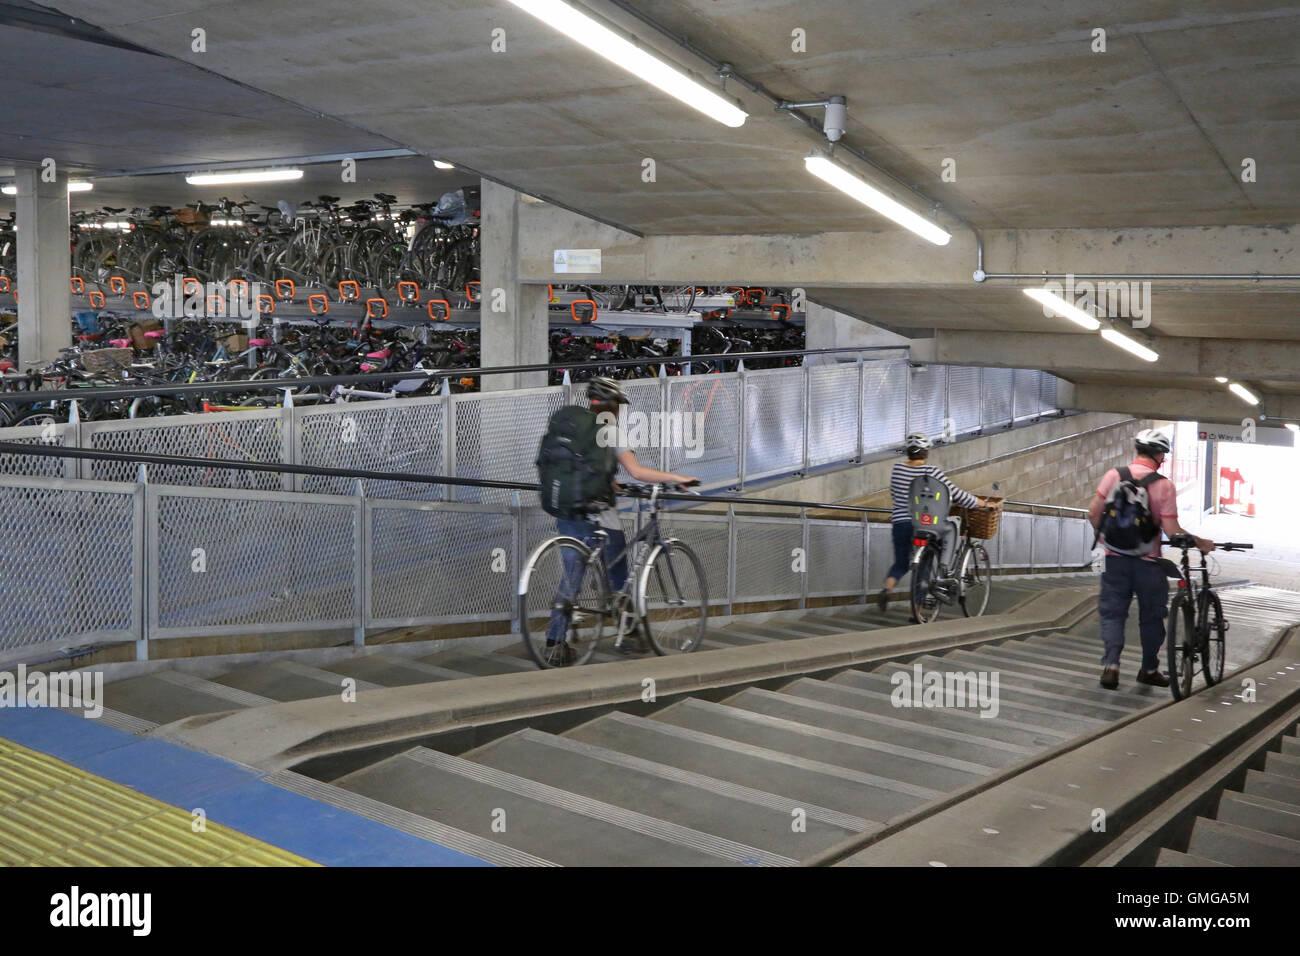 Interior Of A New Multi Storey Bike Park In Cambridge Uk